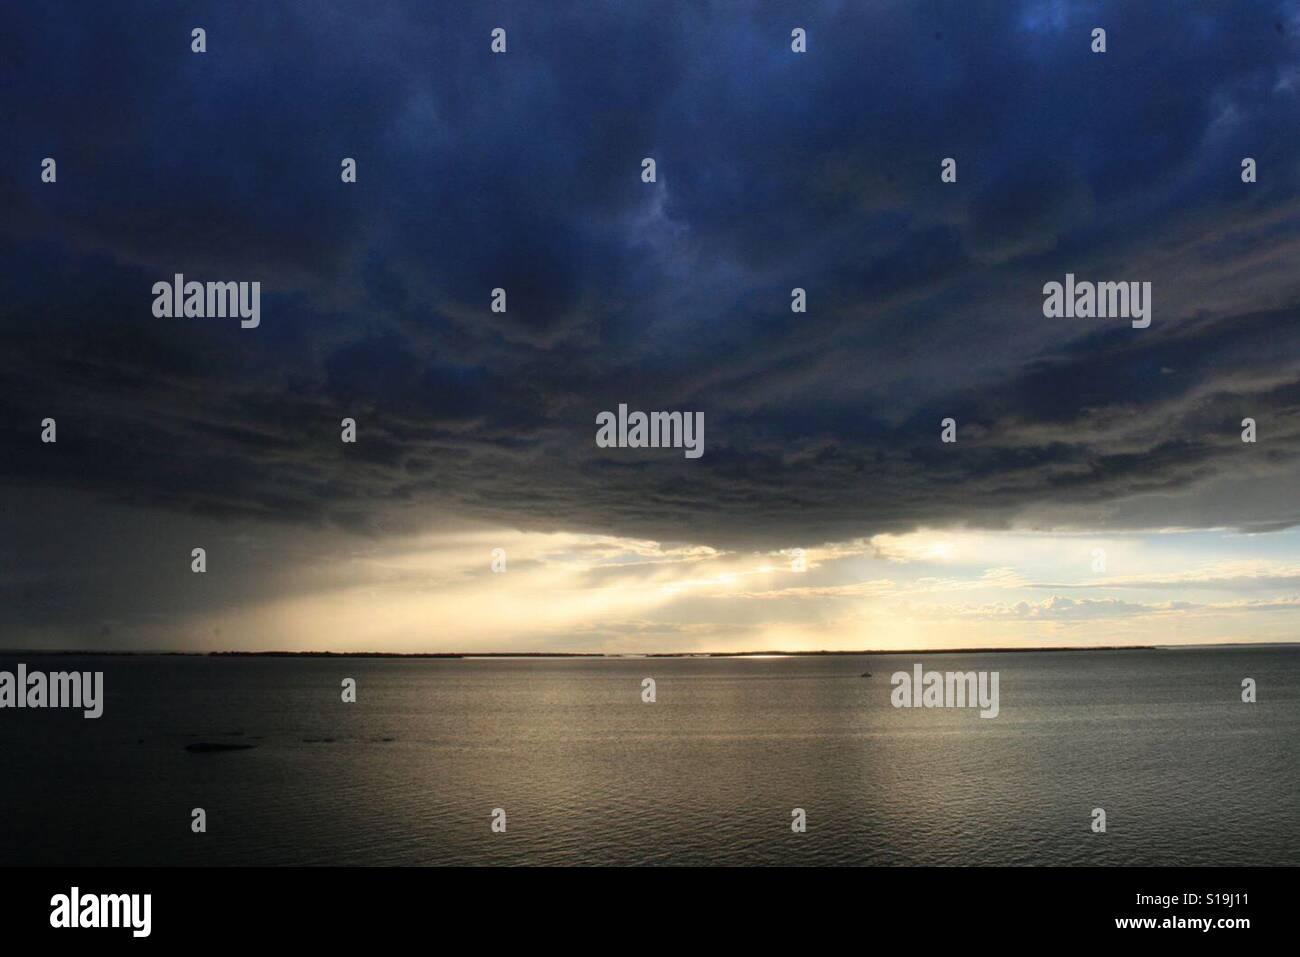 Armageddon - Stock Image